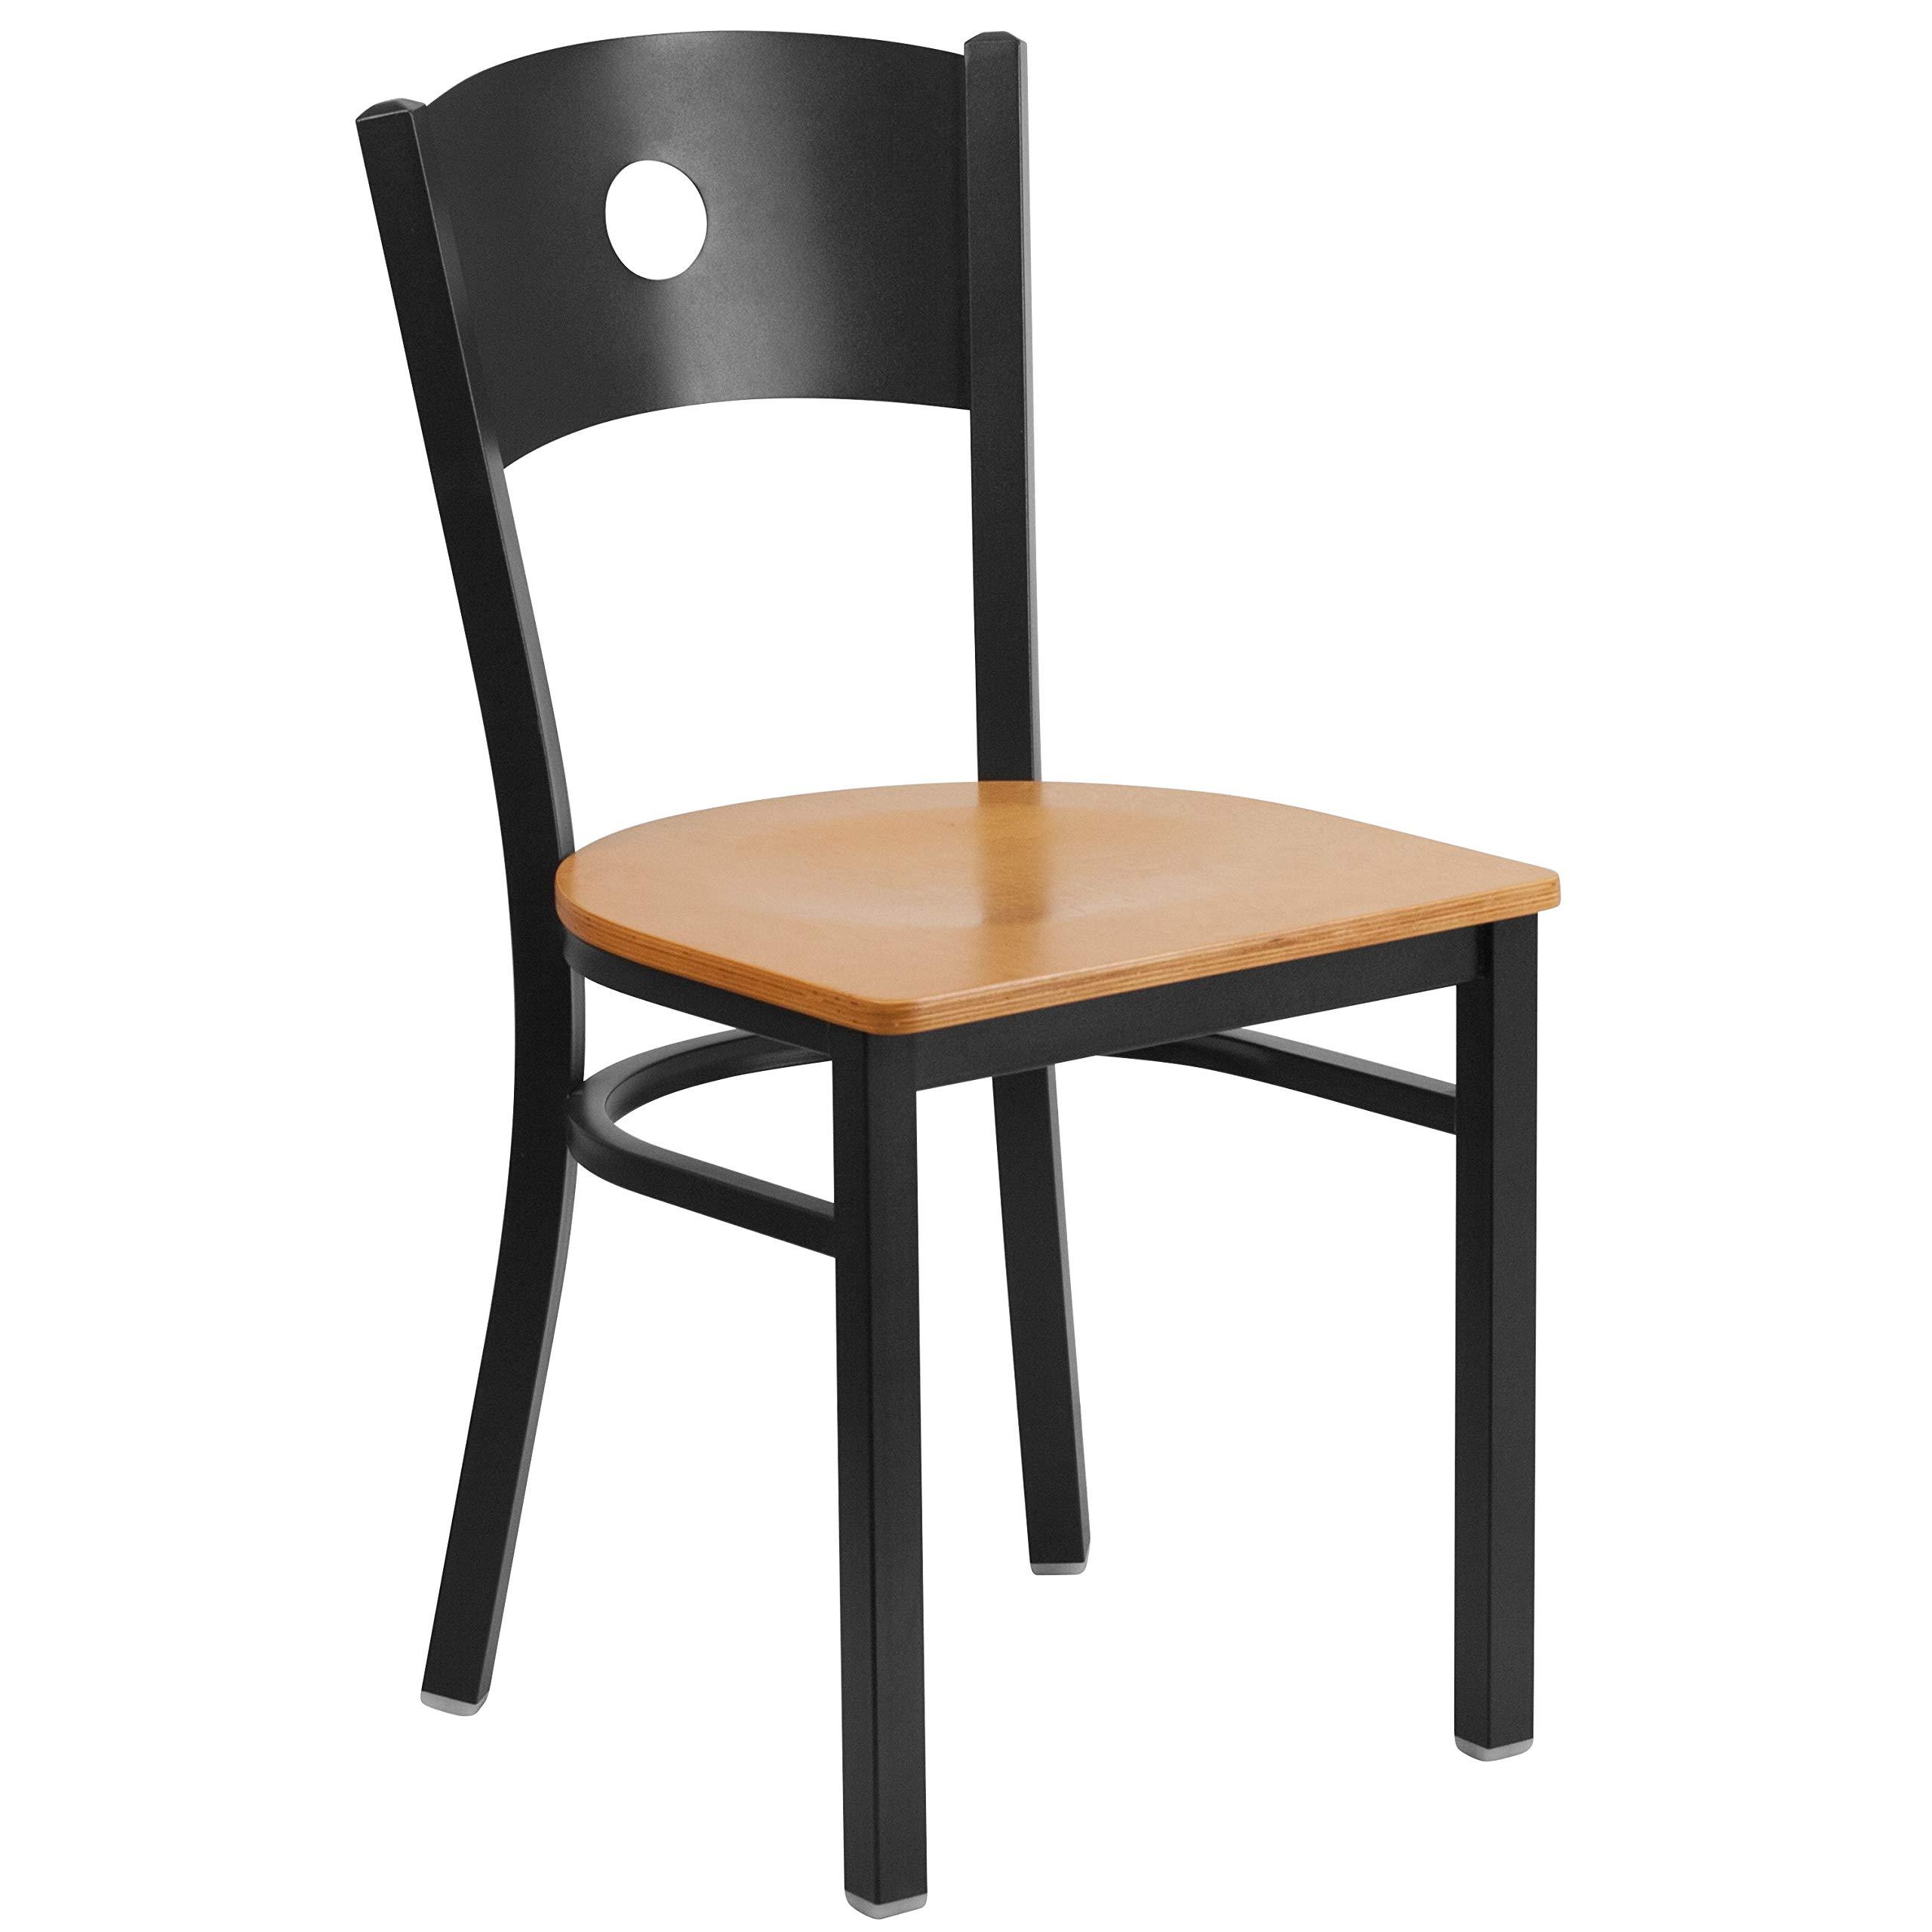 MFO Princeton Collection Black Circle Back Metal Restaurant Chair - Natural Wood Seat